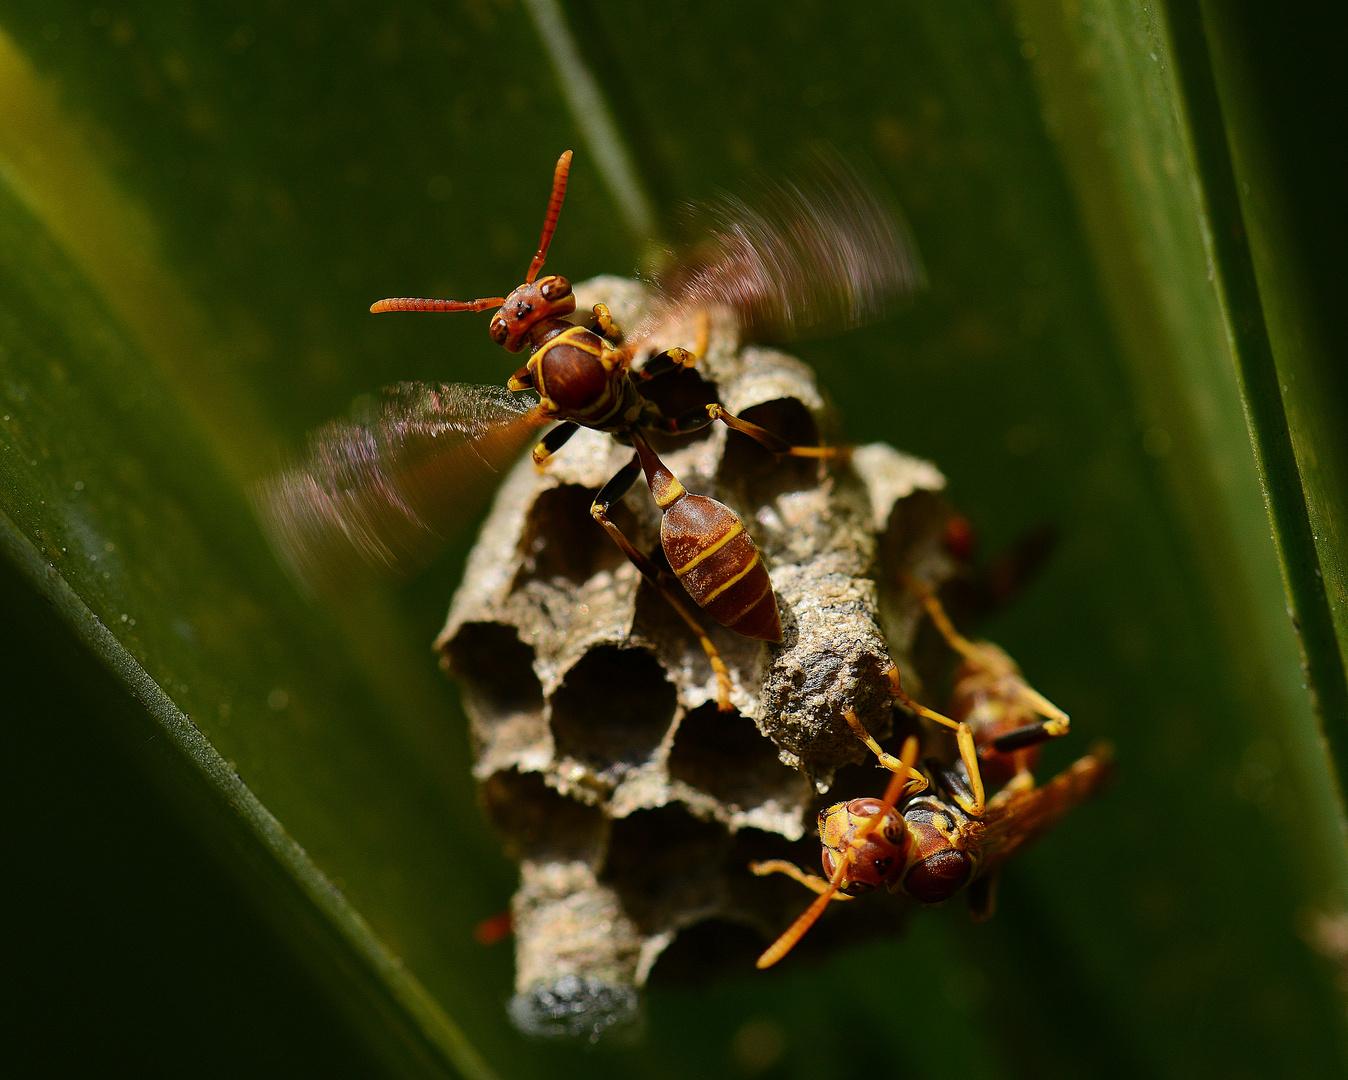 Papierwespe schwirrt am Nest